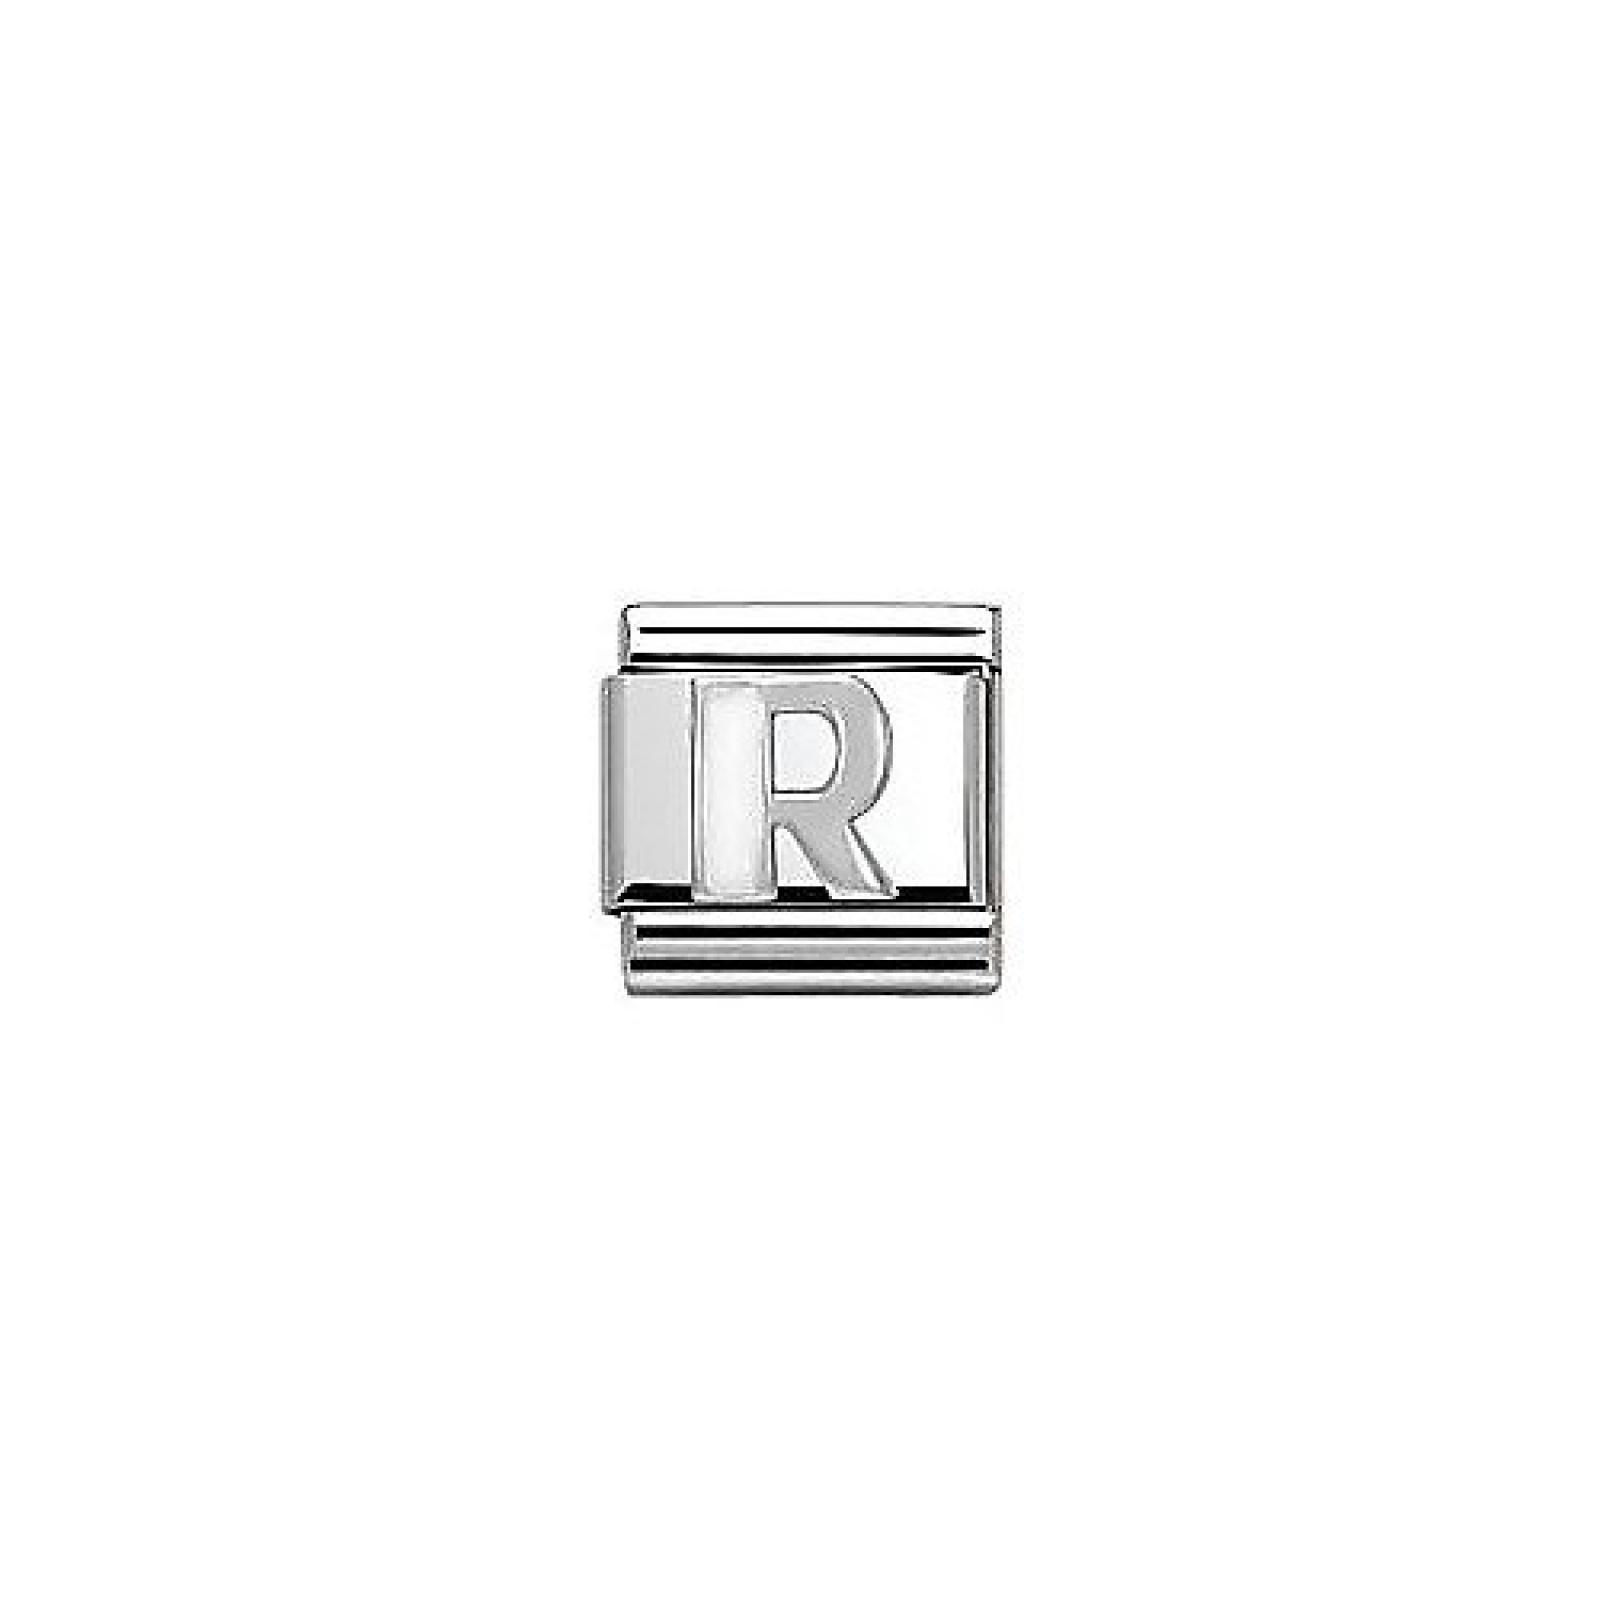 NominatioN Composable Classic WHITE ALPHABET Stahl und 925 sm (R) 330205-18